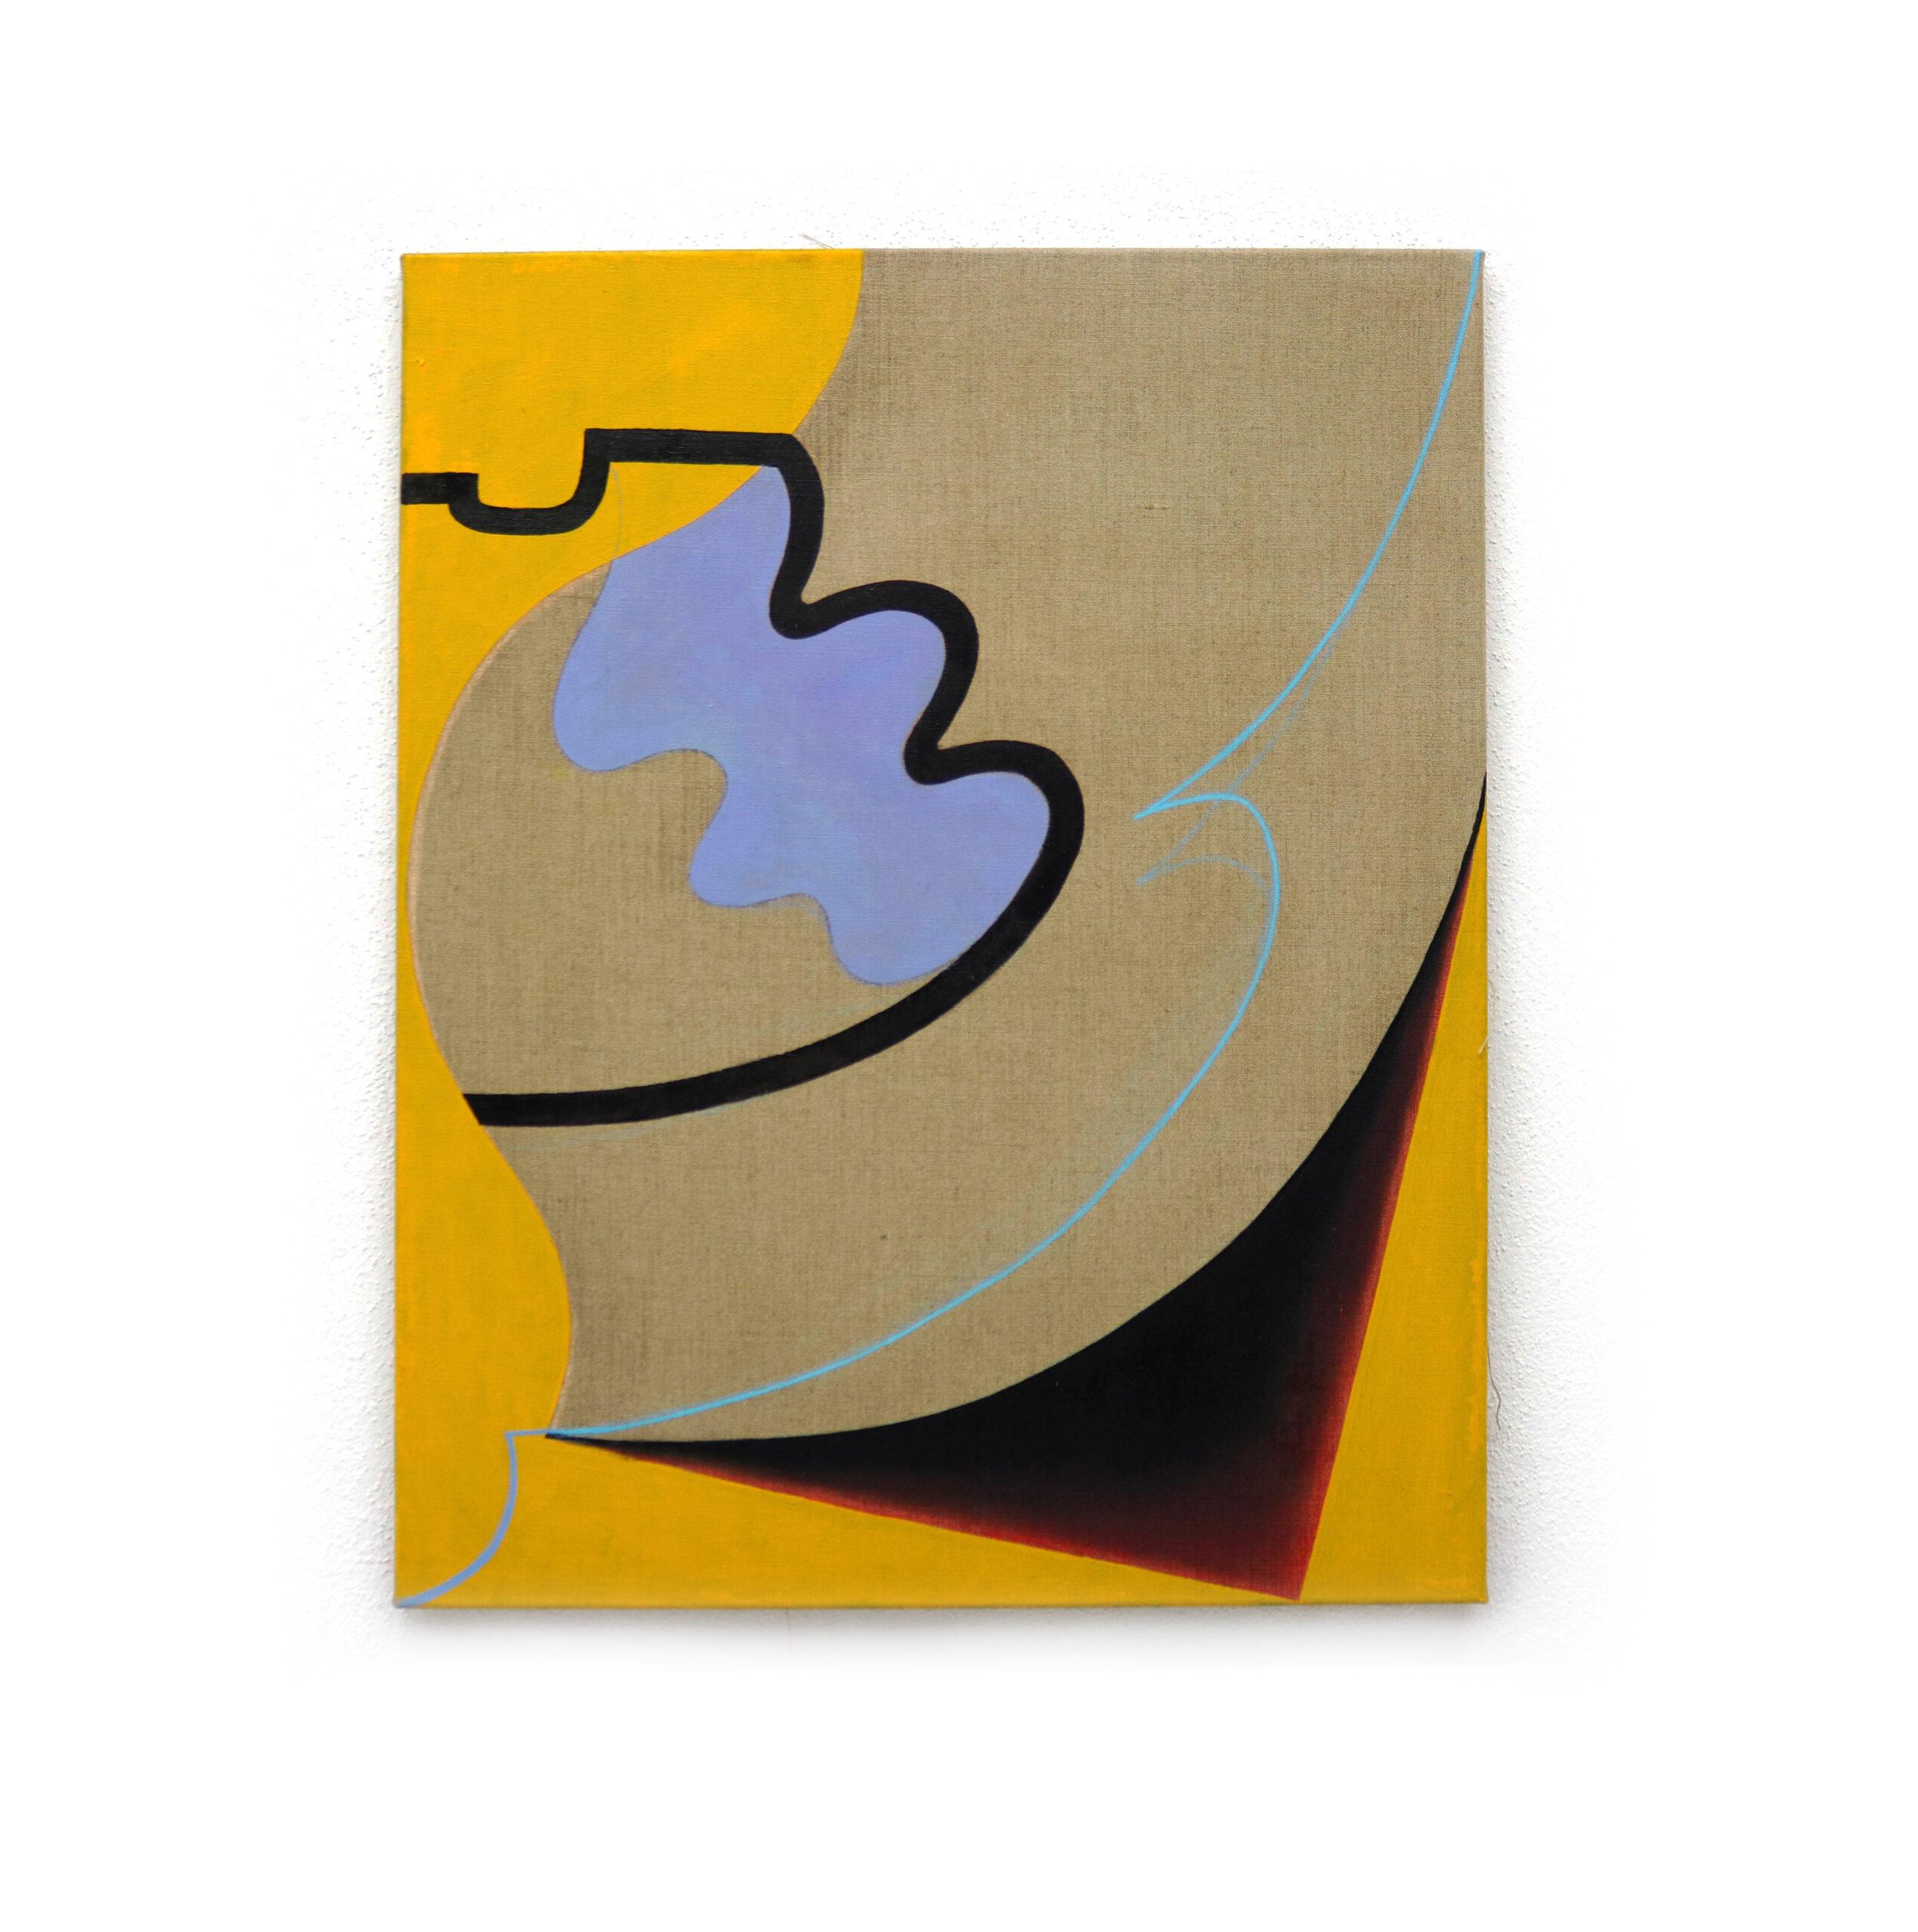 No title, oil on canvas, 75x60cm, 2019